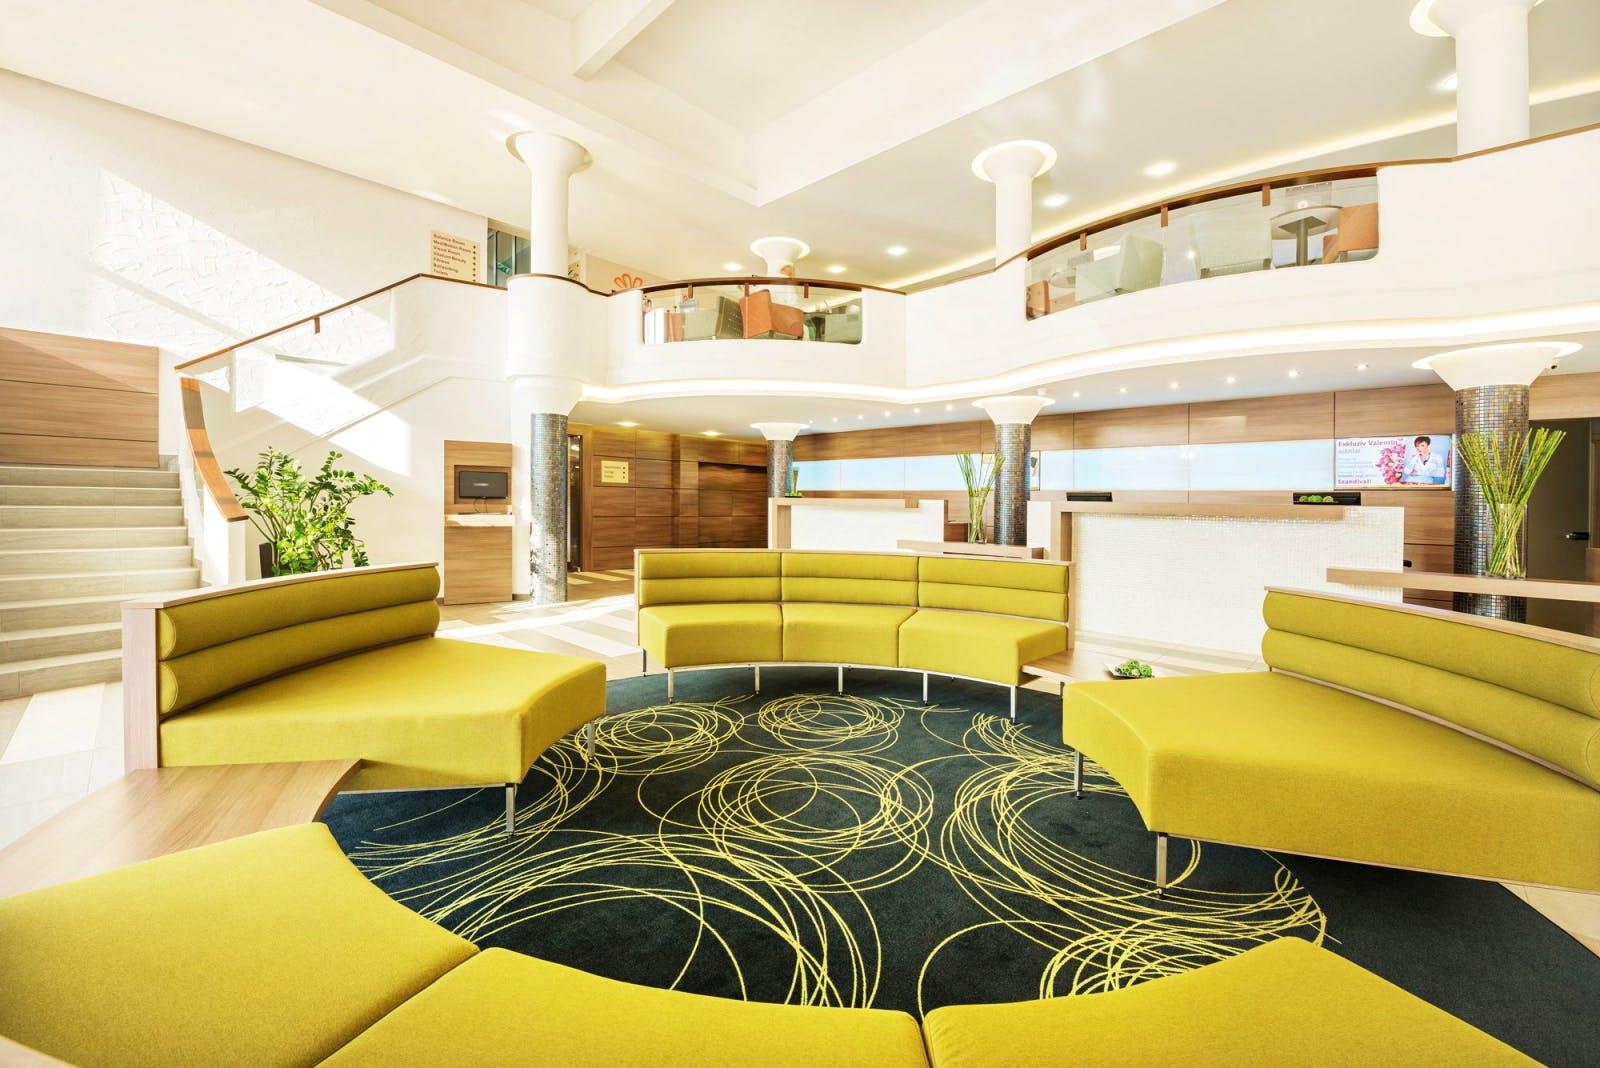 urlaub wellness in ungarn hotel europa fit in heviz saison 2018 busreise huwhe eurof. Black Bedroom Furniture Sets. Home Design Ideas